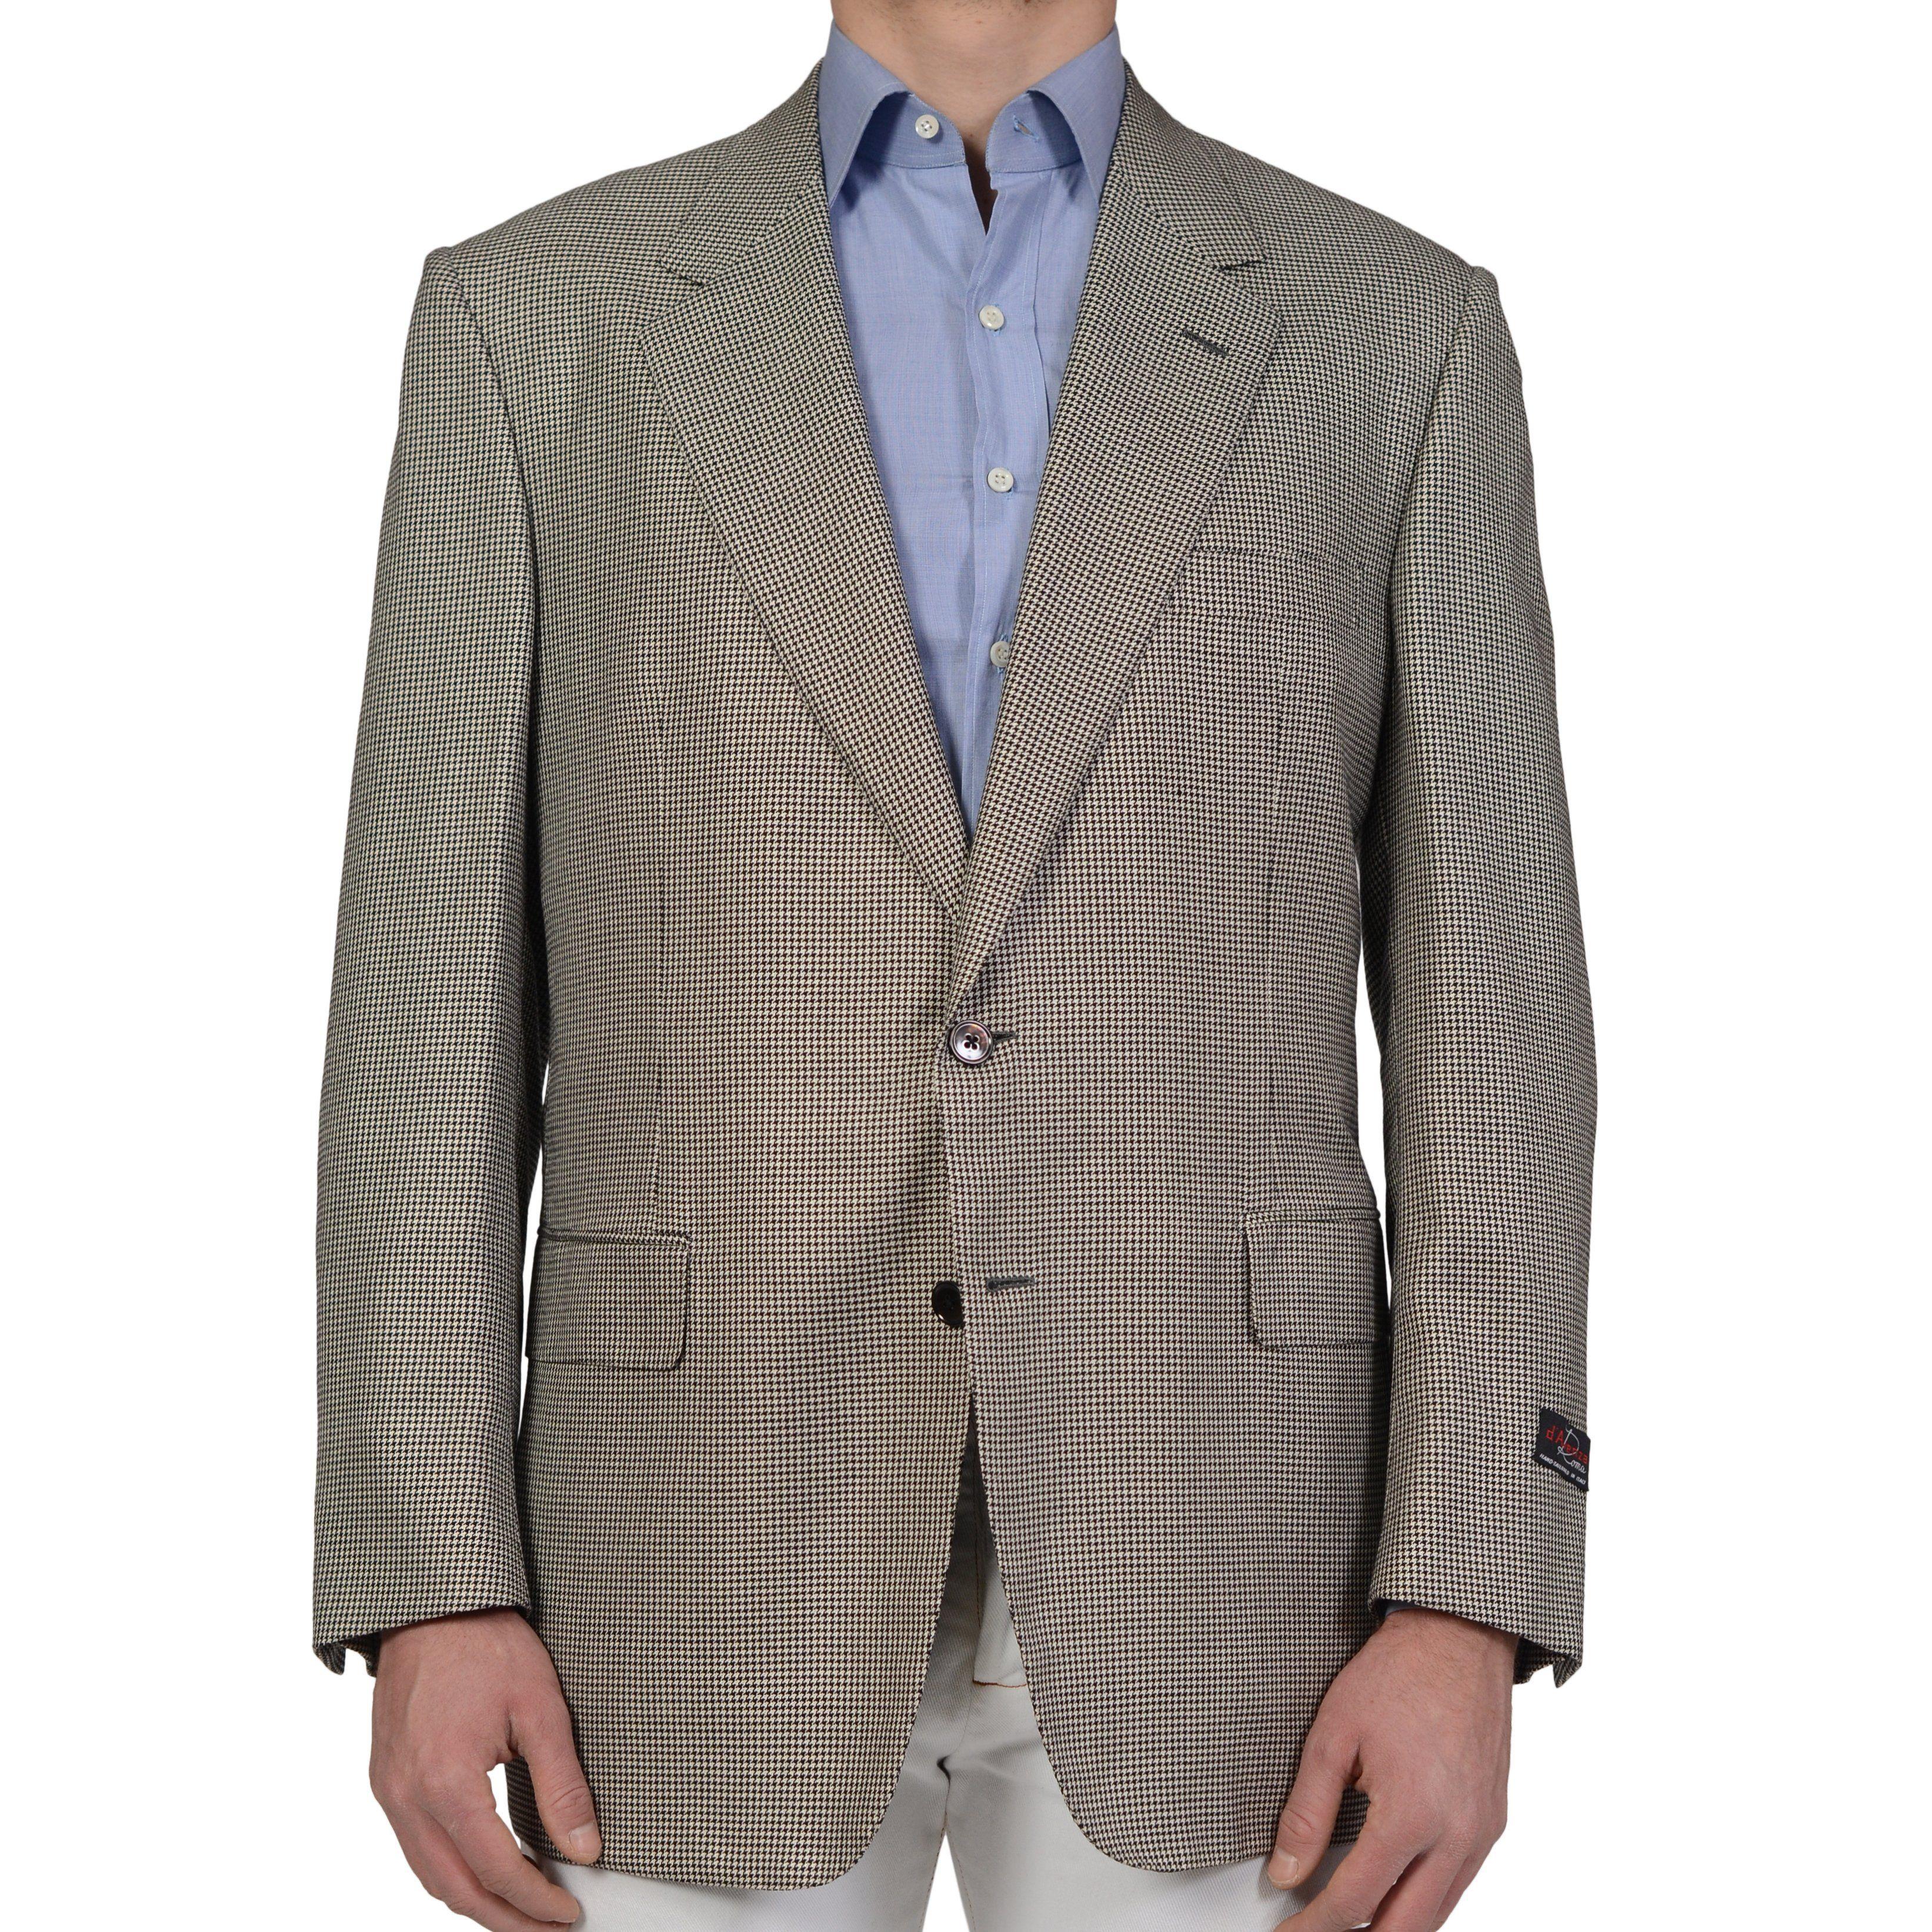 D'AVENZA Handmade Gray Houndstooth Wool Silk Cashmere Jacket EU 56 NEW US 46